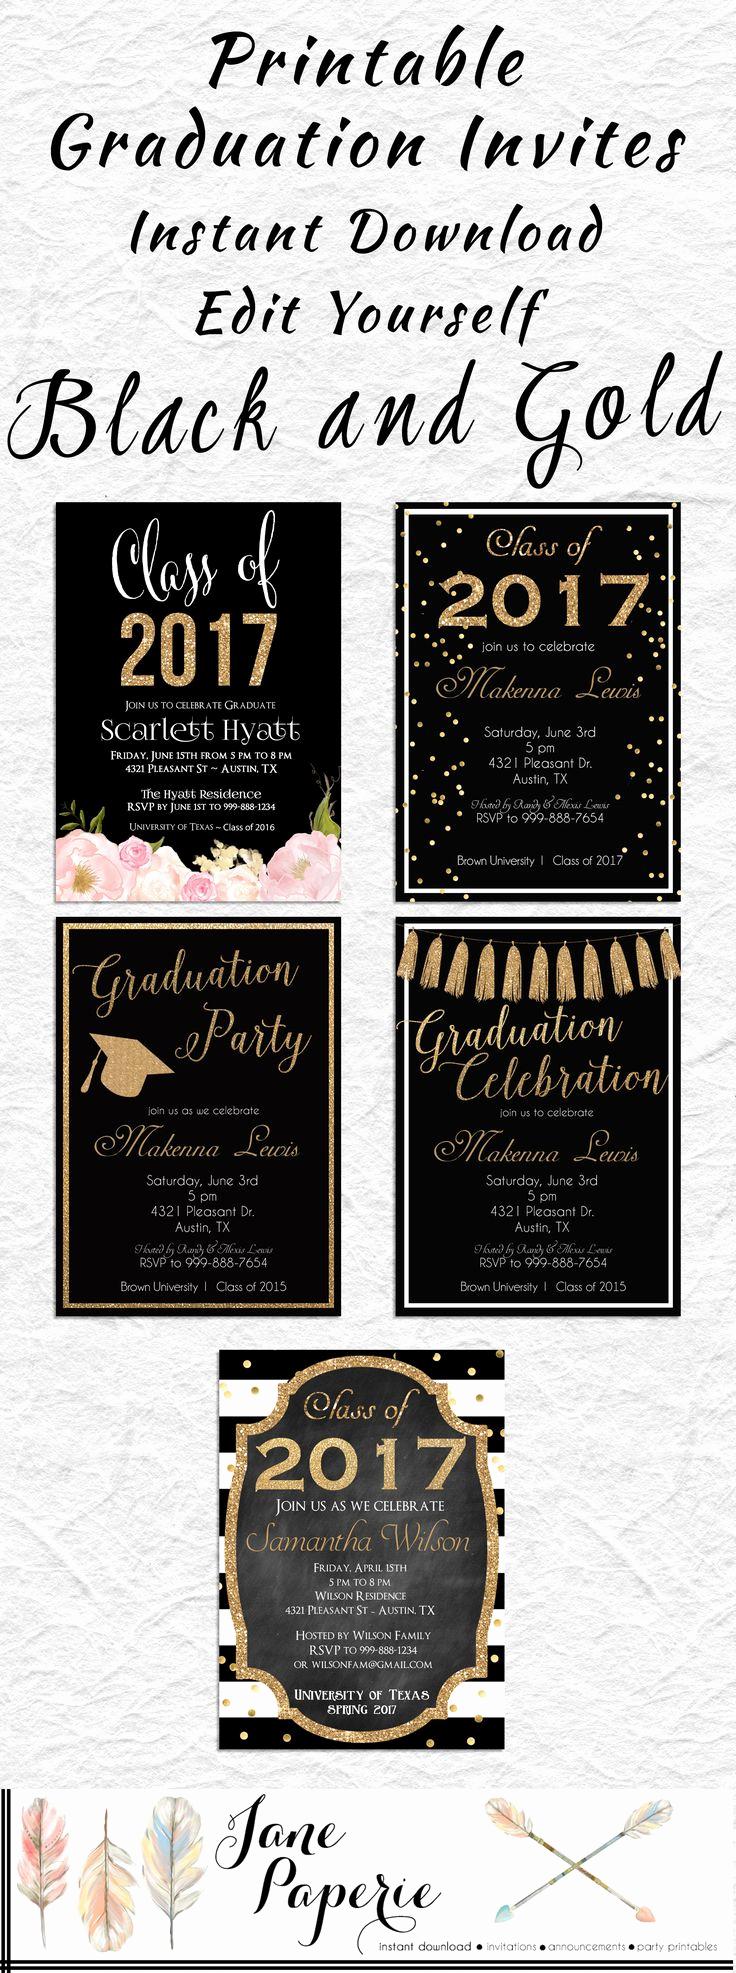 College Grad Party Invitation Inspirational Best 25 High School Graduation Invitations Ideas On